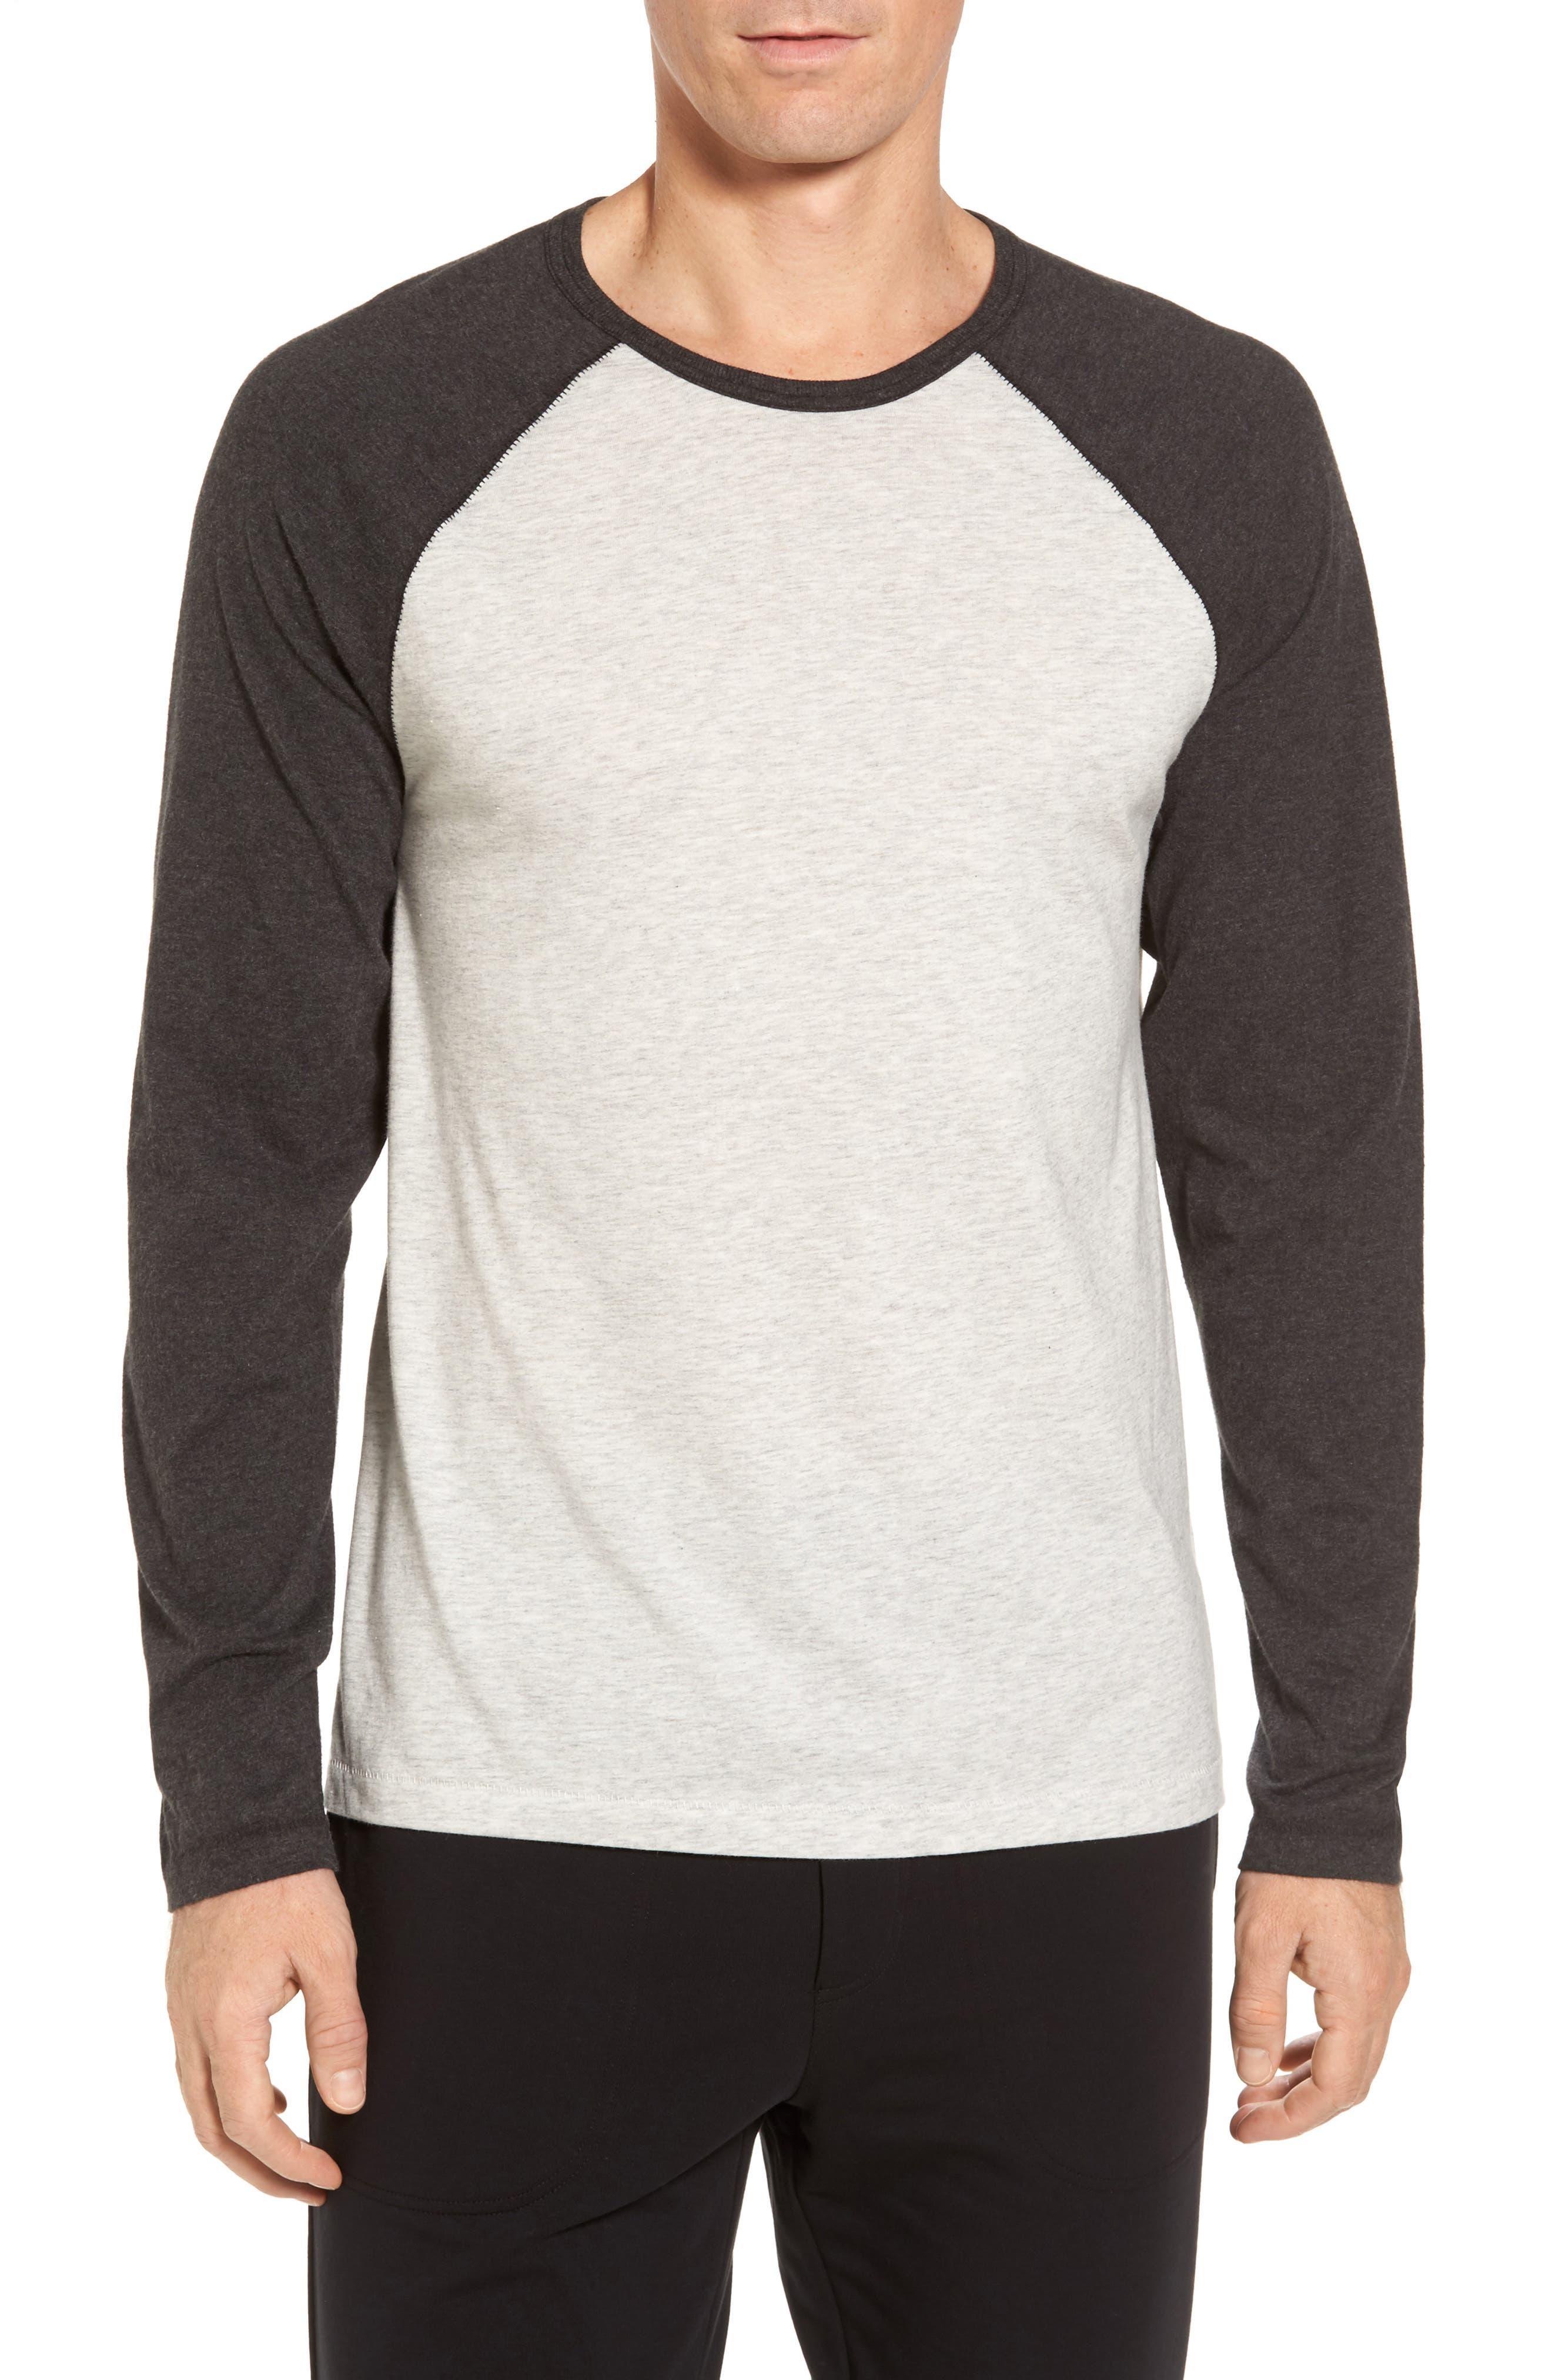 Stefan Raglan T-Shirt,                             Main thumbnail 1, color,                             Seal Heather/ Black Bear